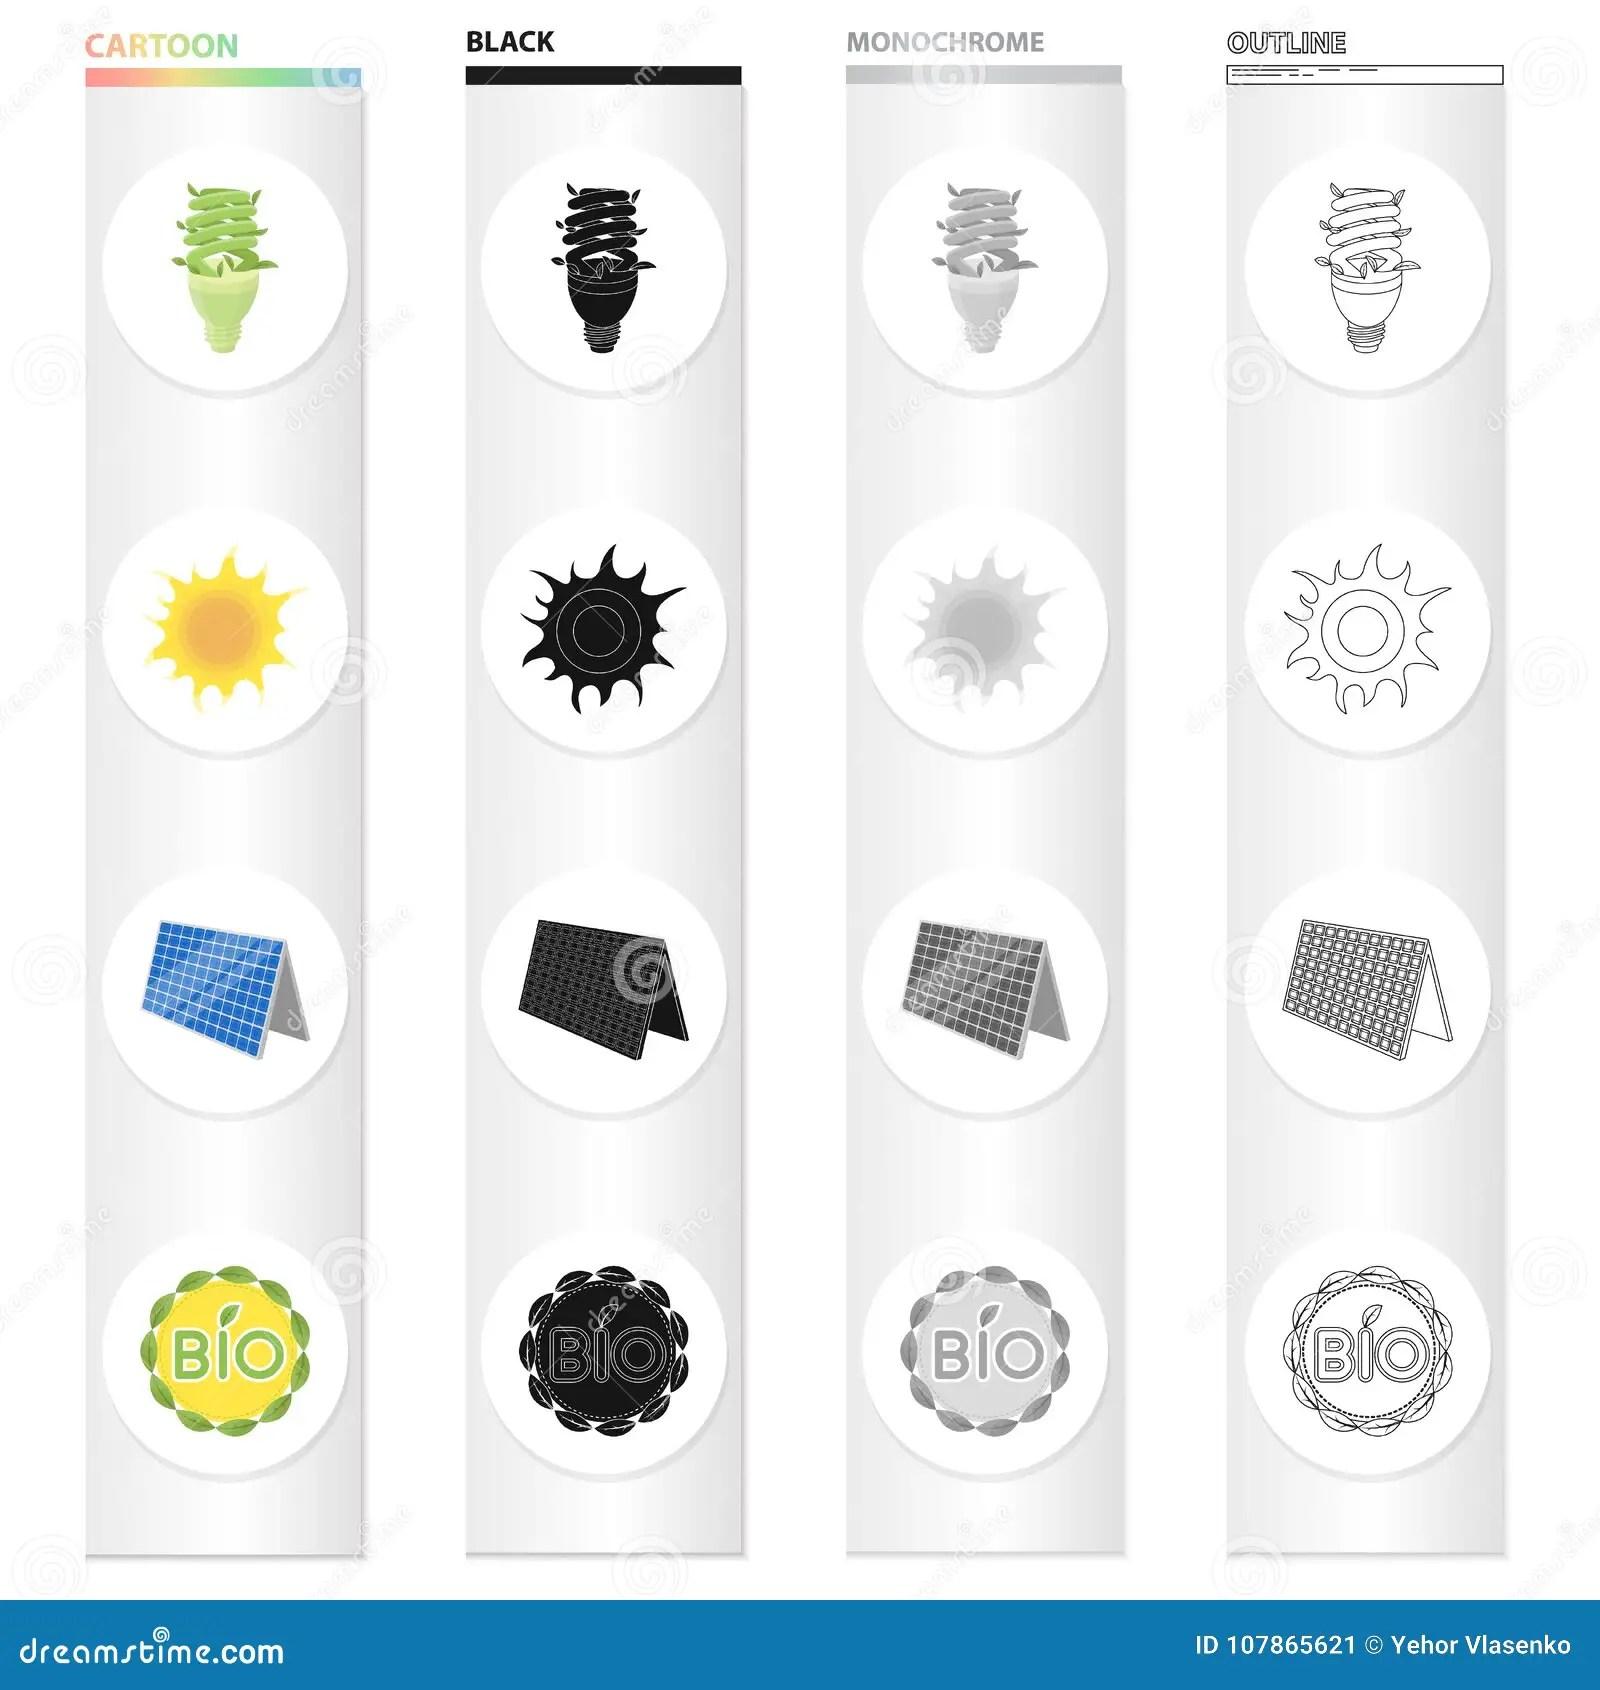 Economical Light Bulb Solar Battery Sun Bio Label